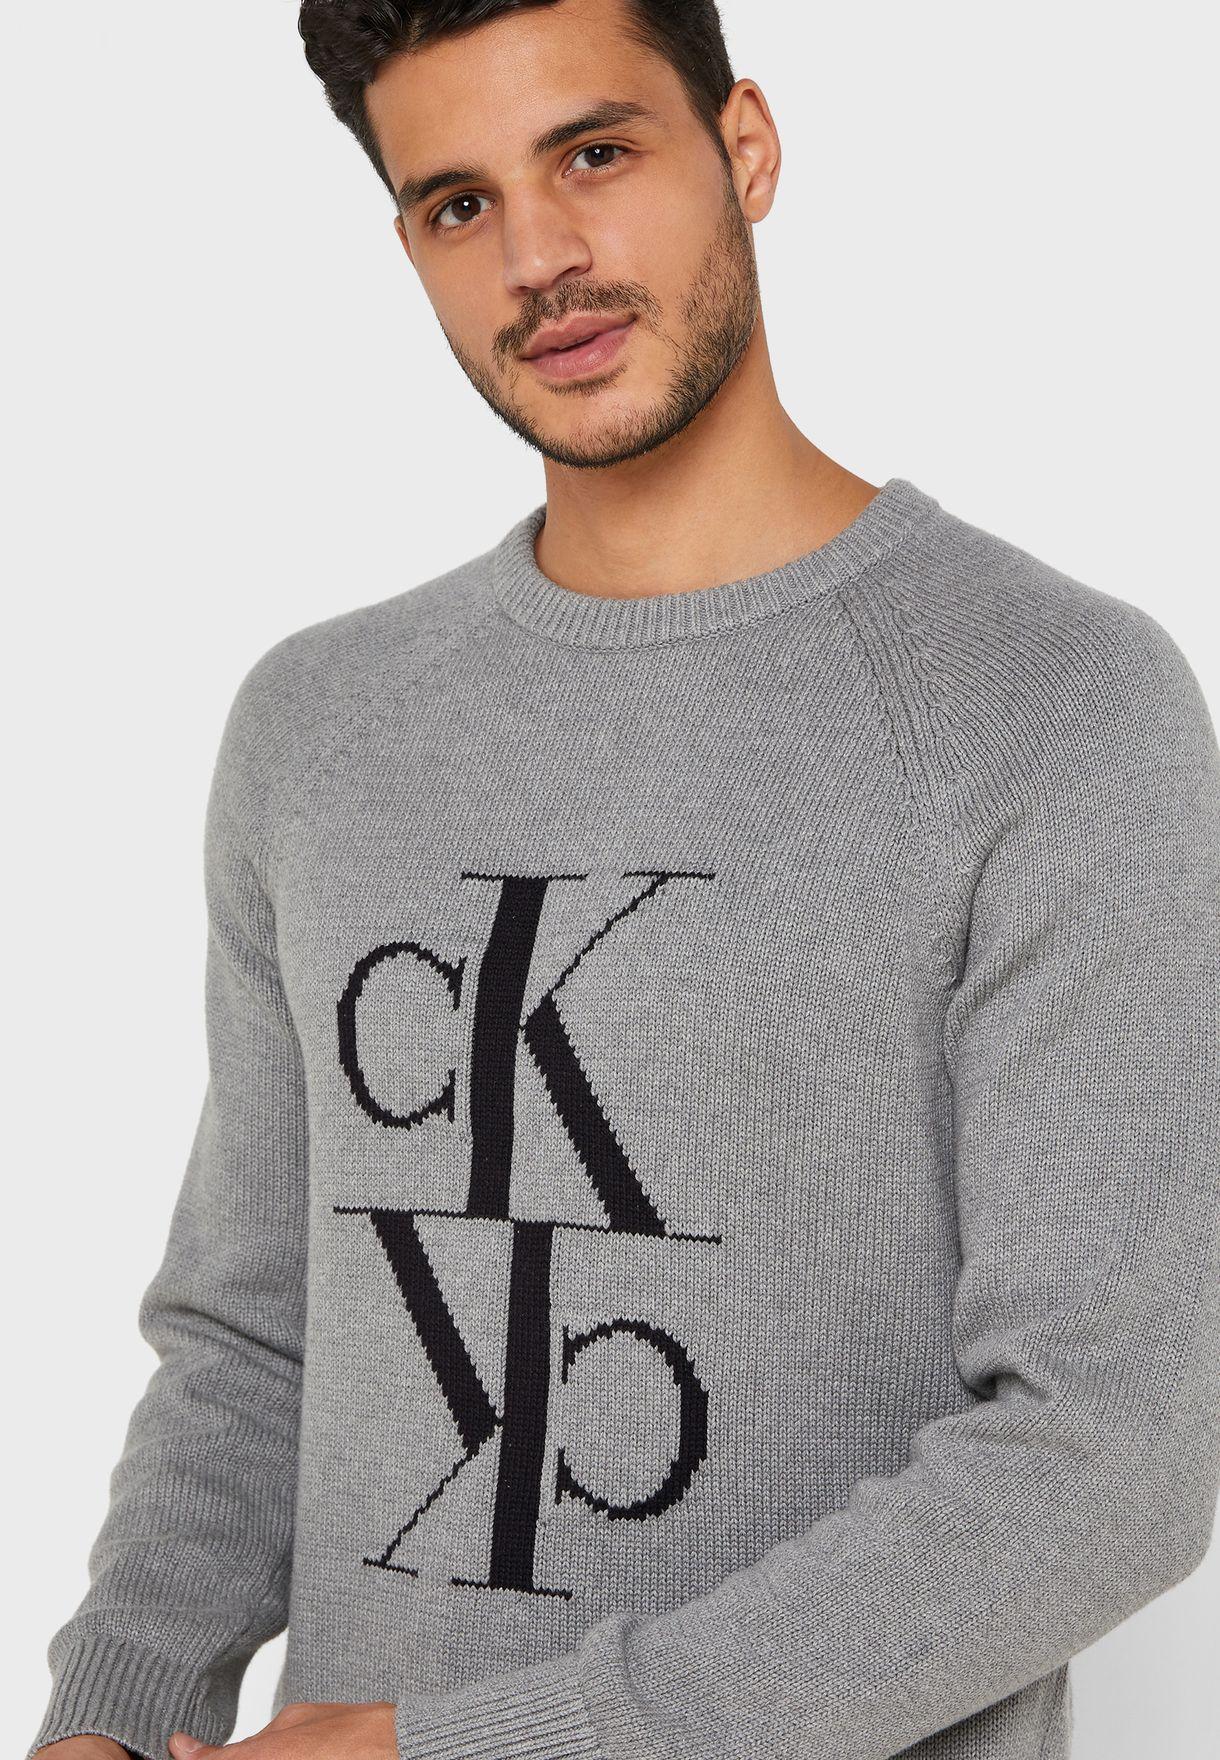 Mirrored Logo Sweater